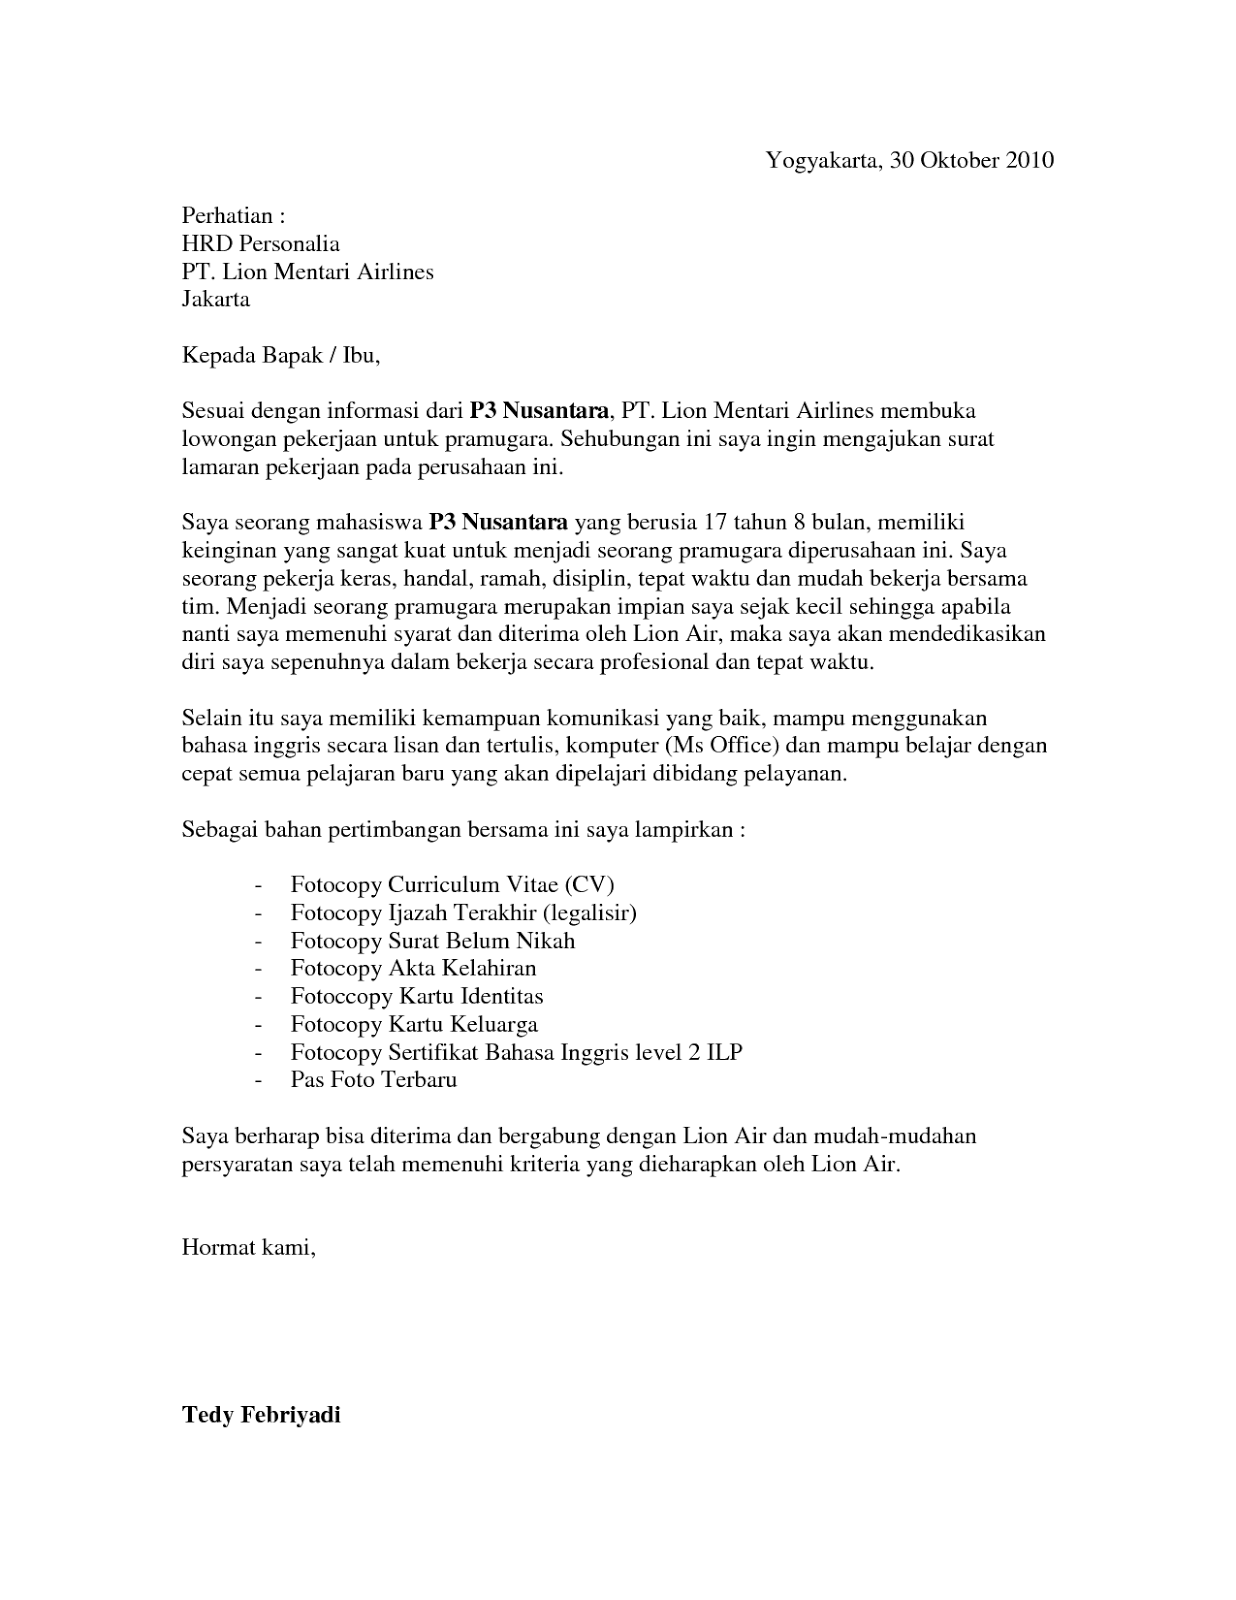 Contoh Surat Lamaran Kerja Ke Penerbangan Airlines Surat Penerbangan Bahasa